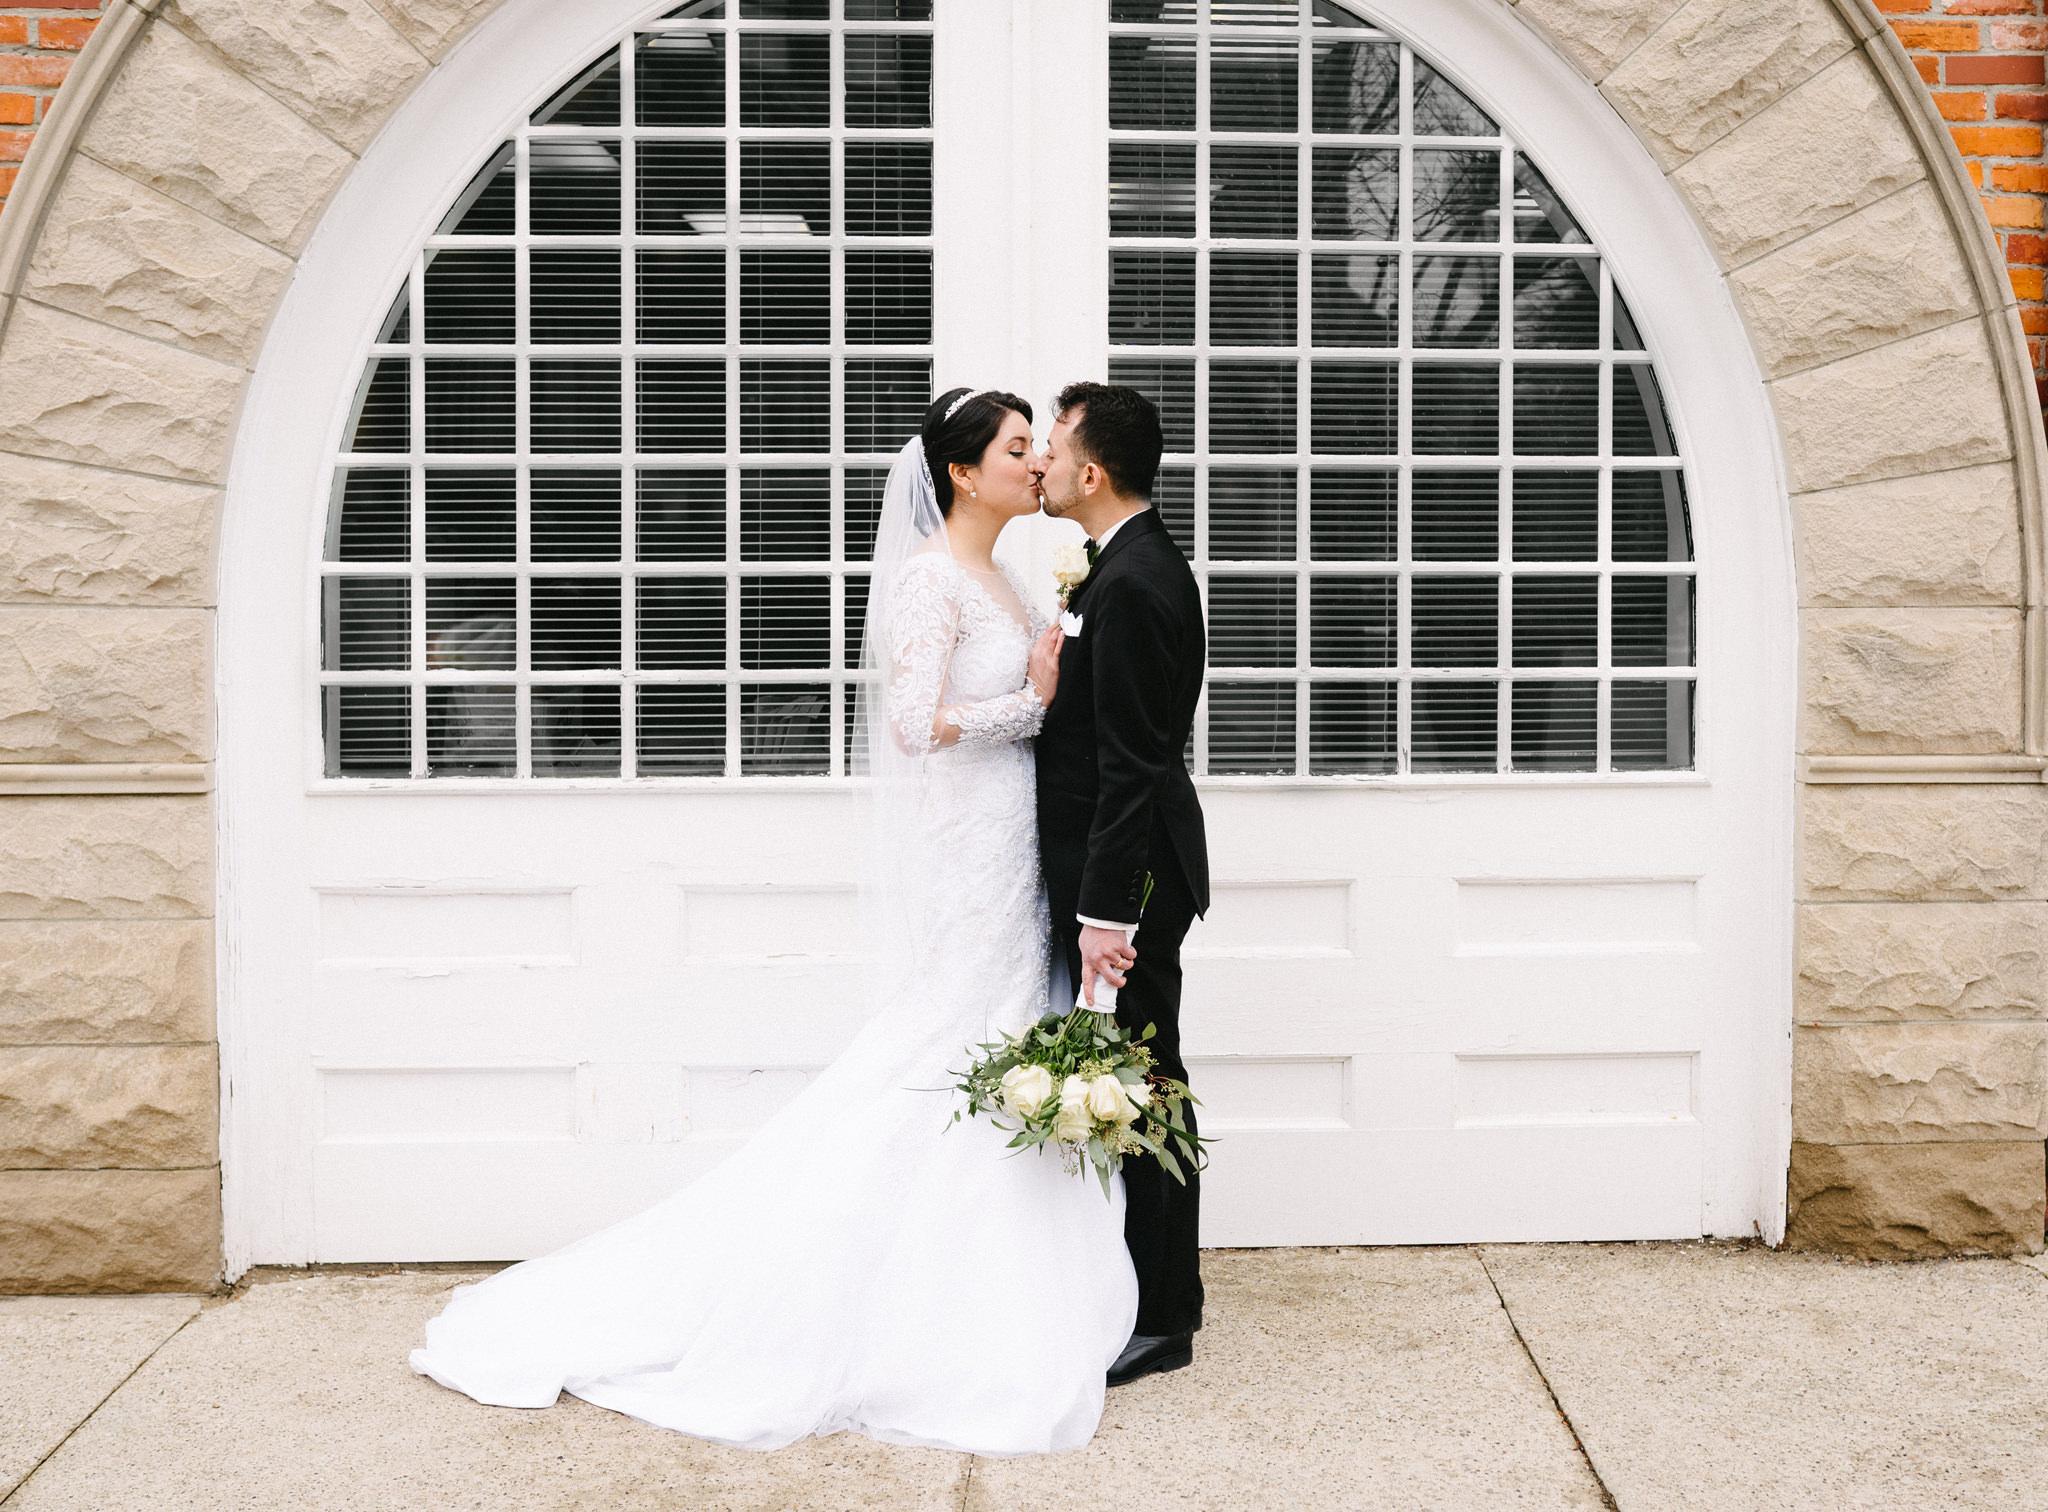 054-rempel-photography-chicago-wedding-inspiration-susan-daniel-michigan-metro-detroit-christian-church-holly-vault-cupcakes-and-kisses.jpg